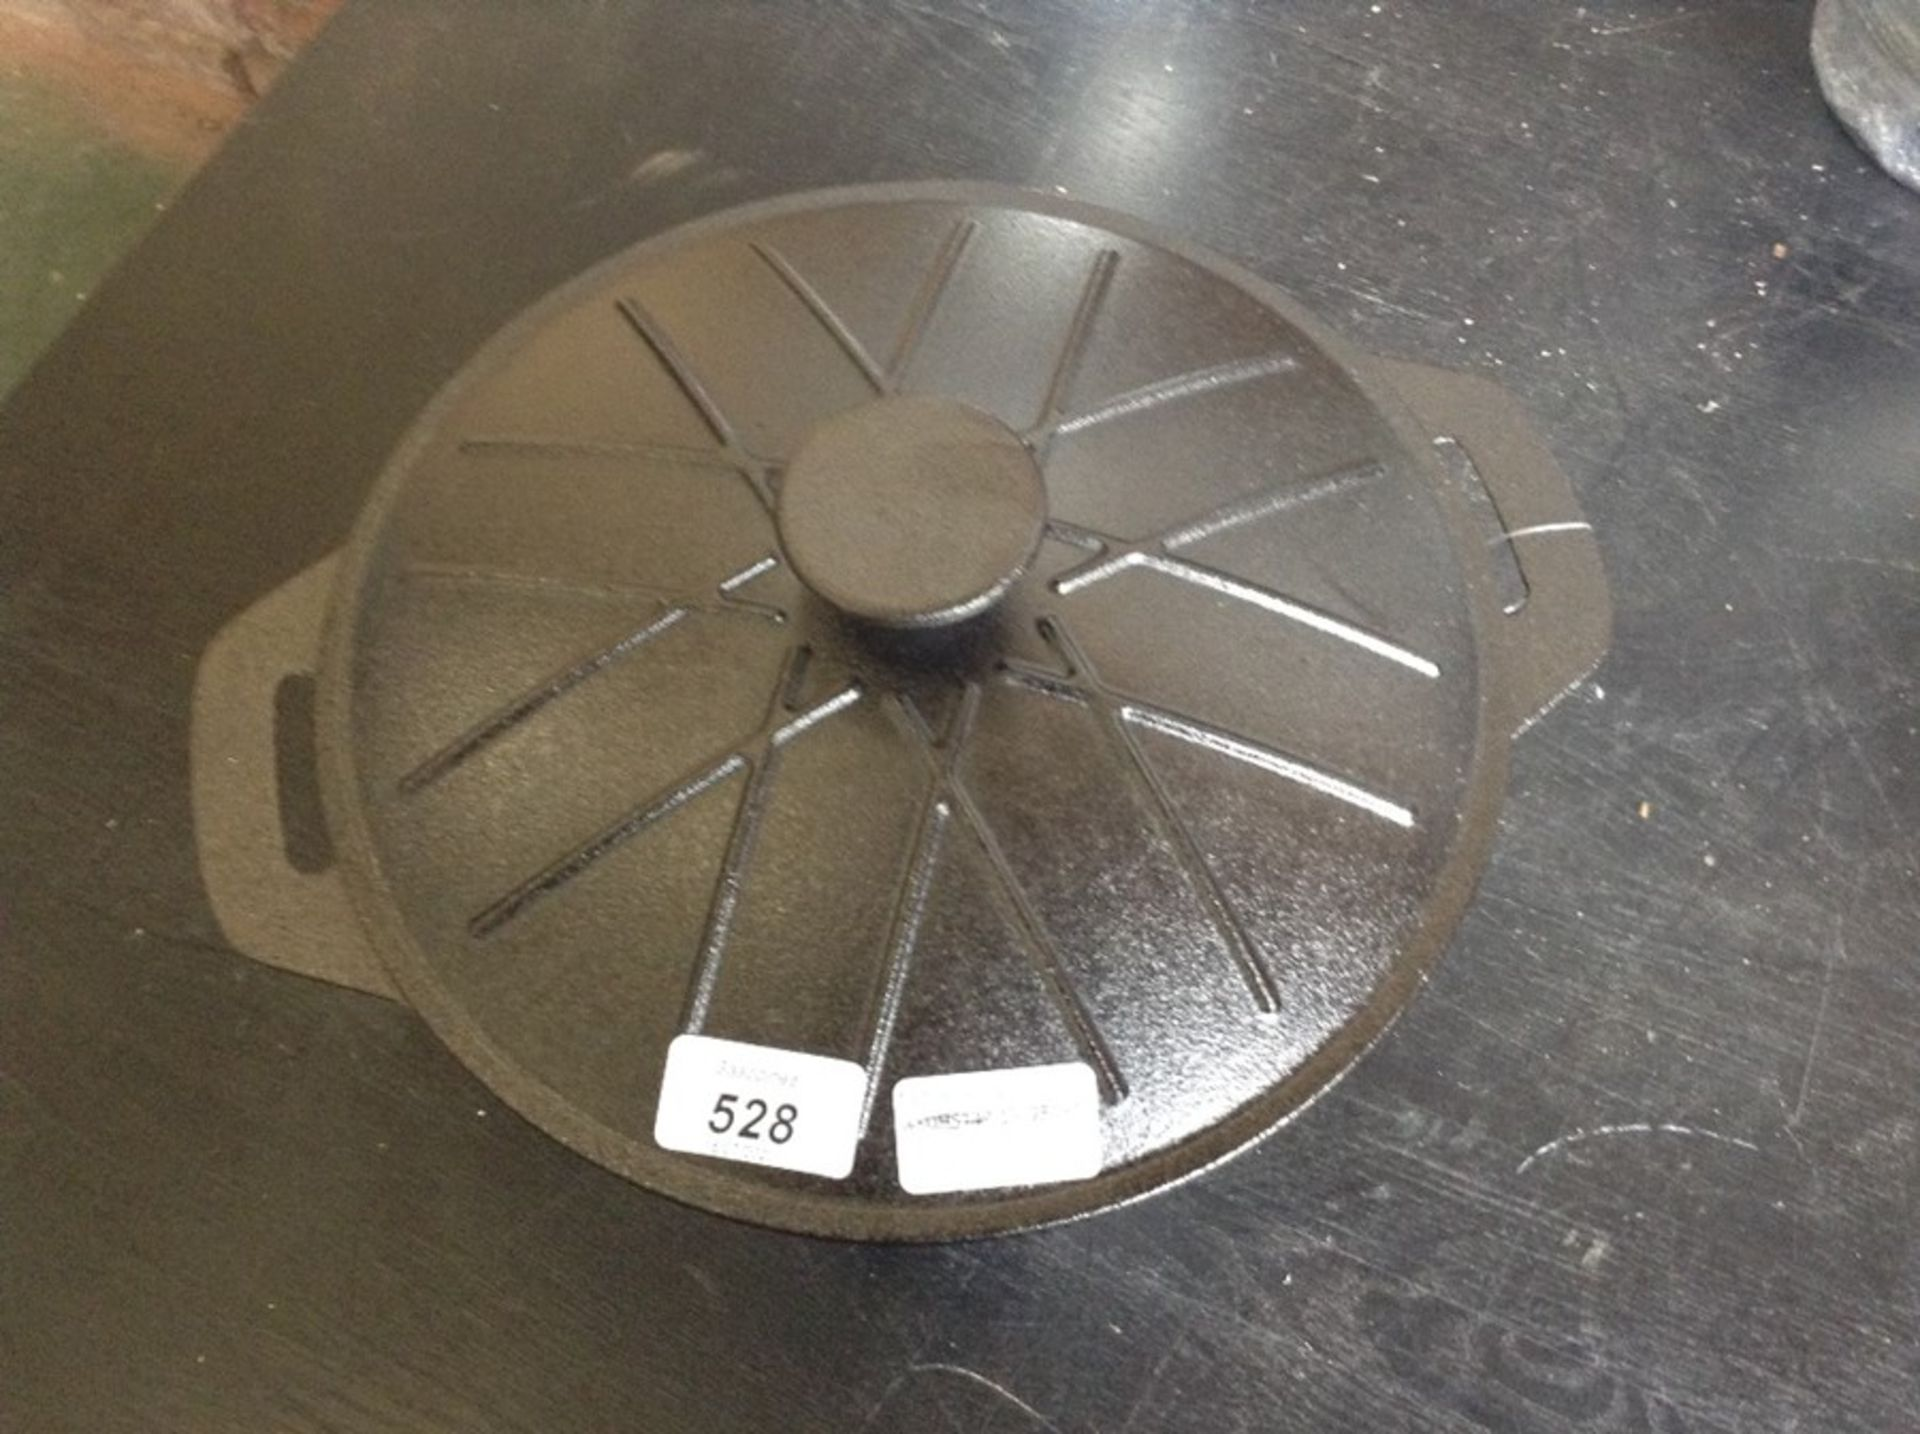 Lot 528 - VonShef,4.7 L Cast Iron Round Casserole RRP -£34.9